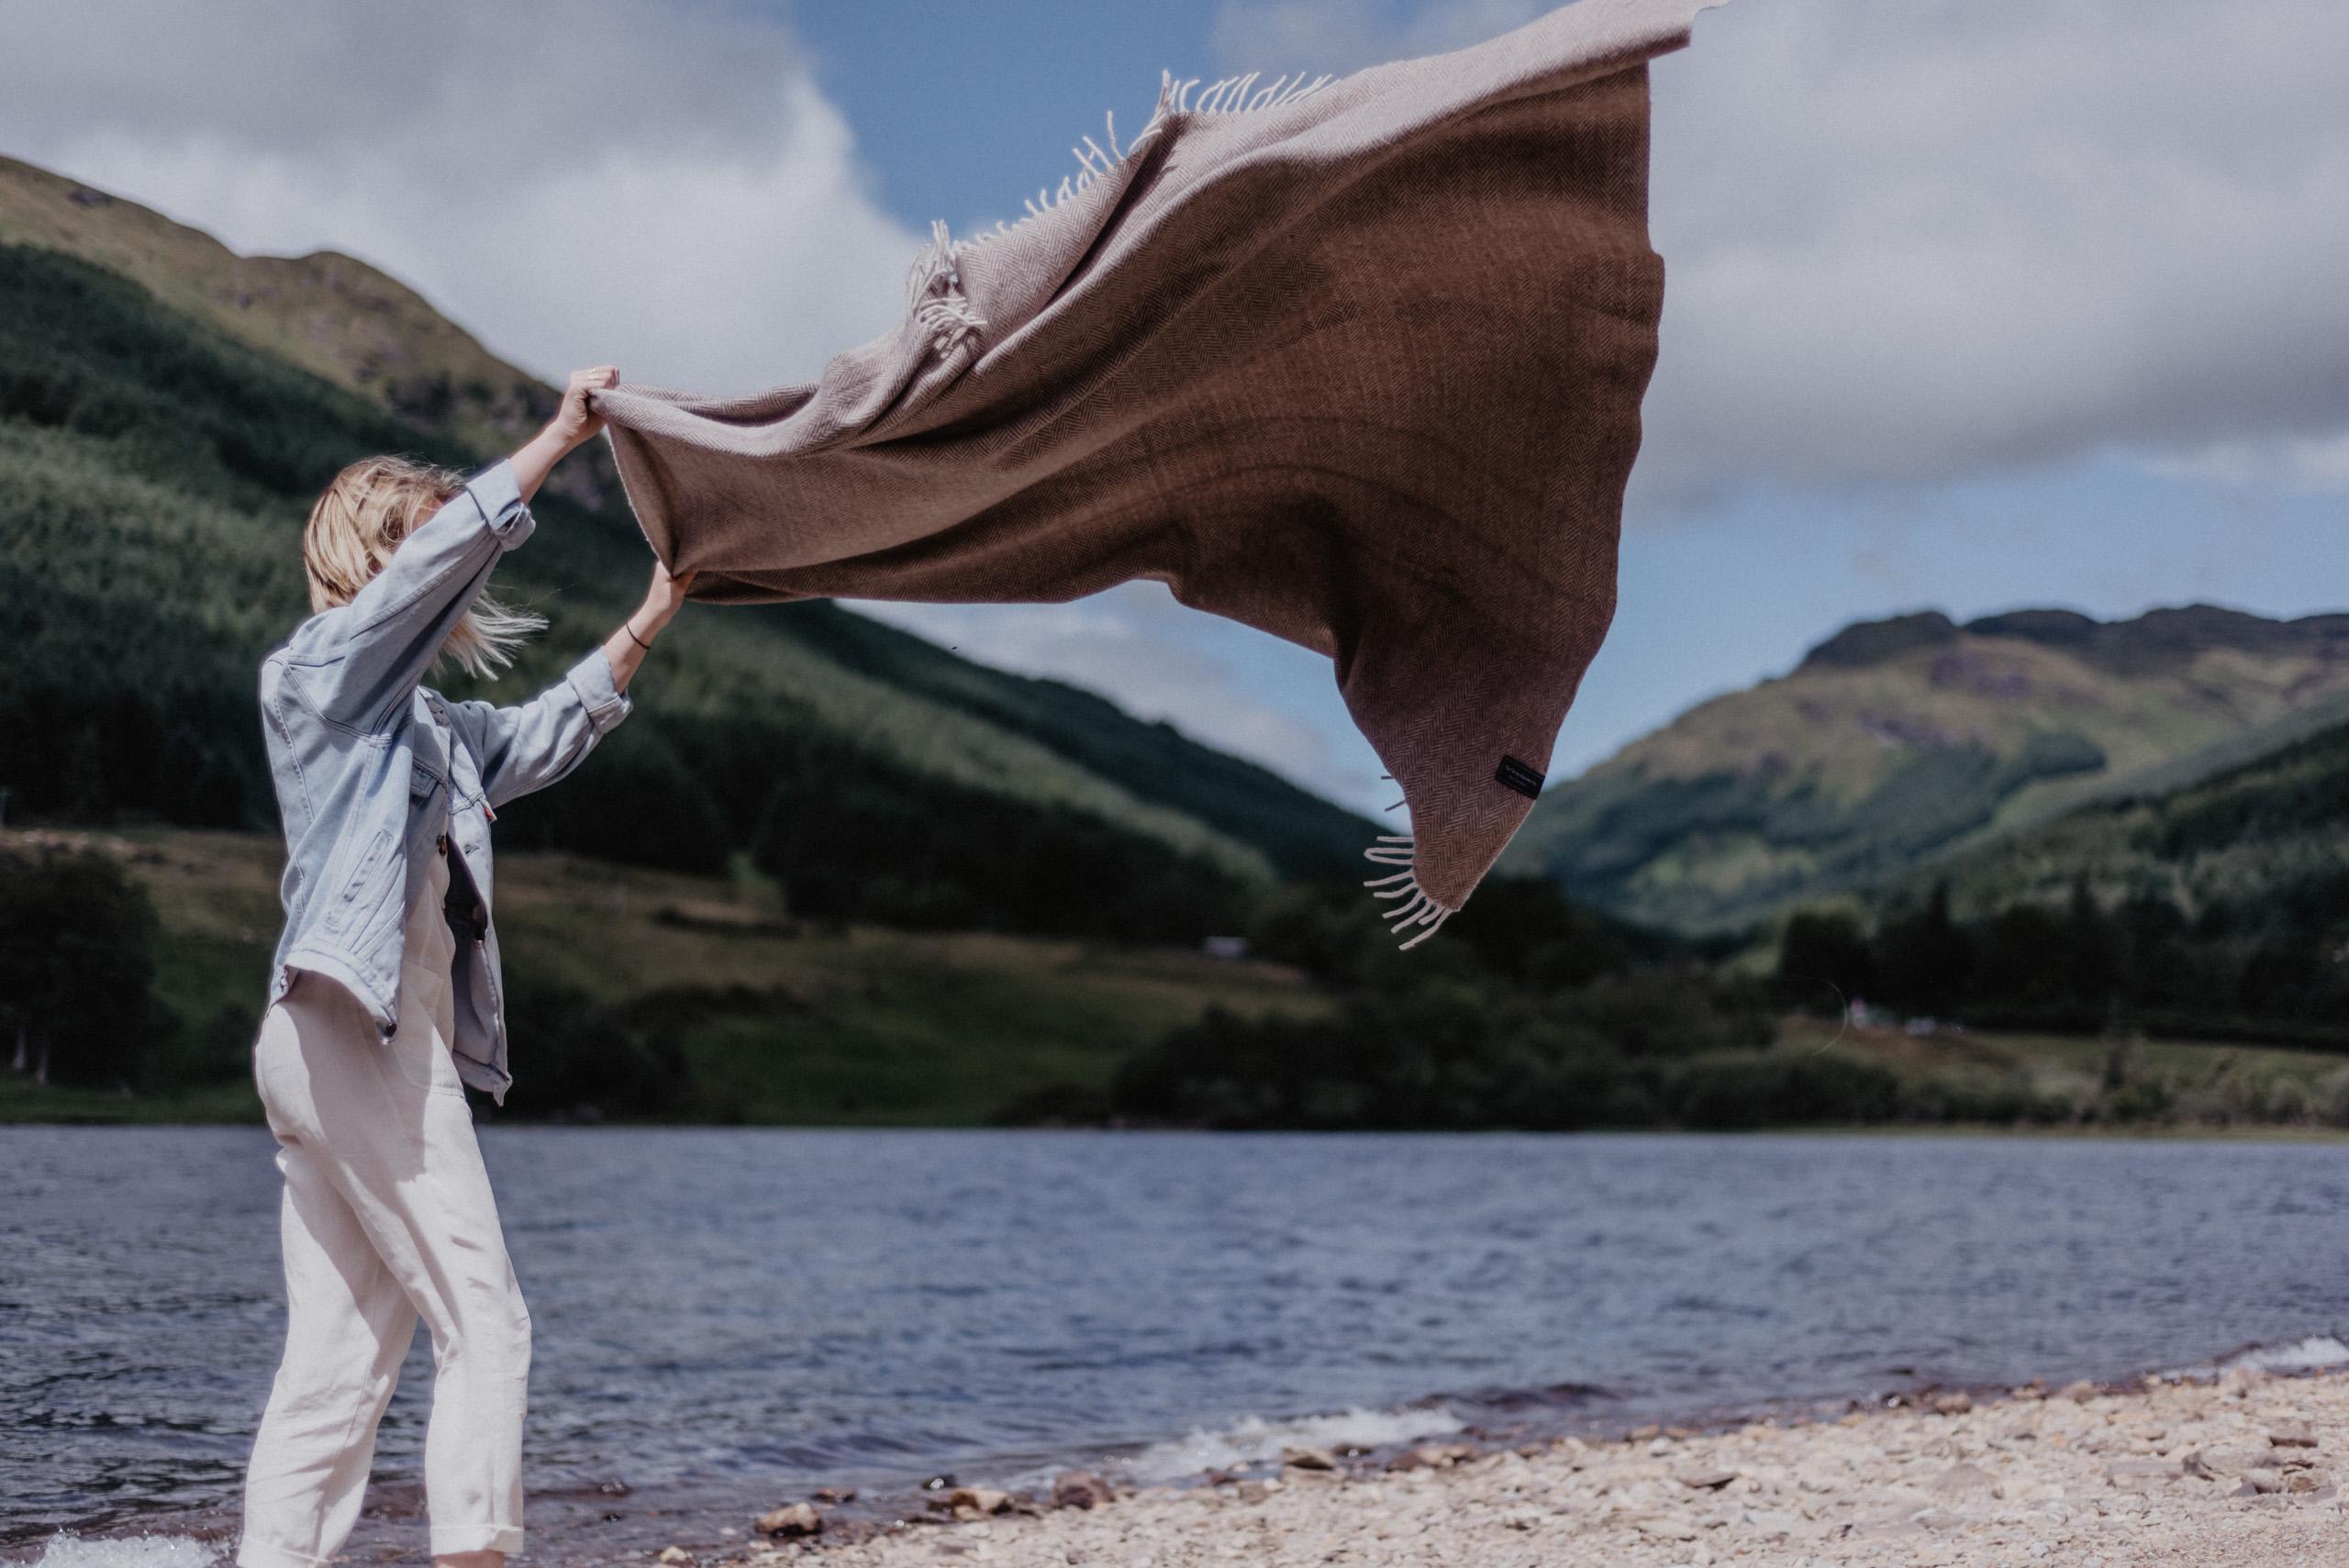 The Tartan Blanket co outdoors